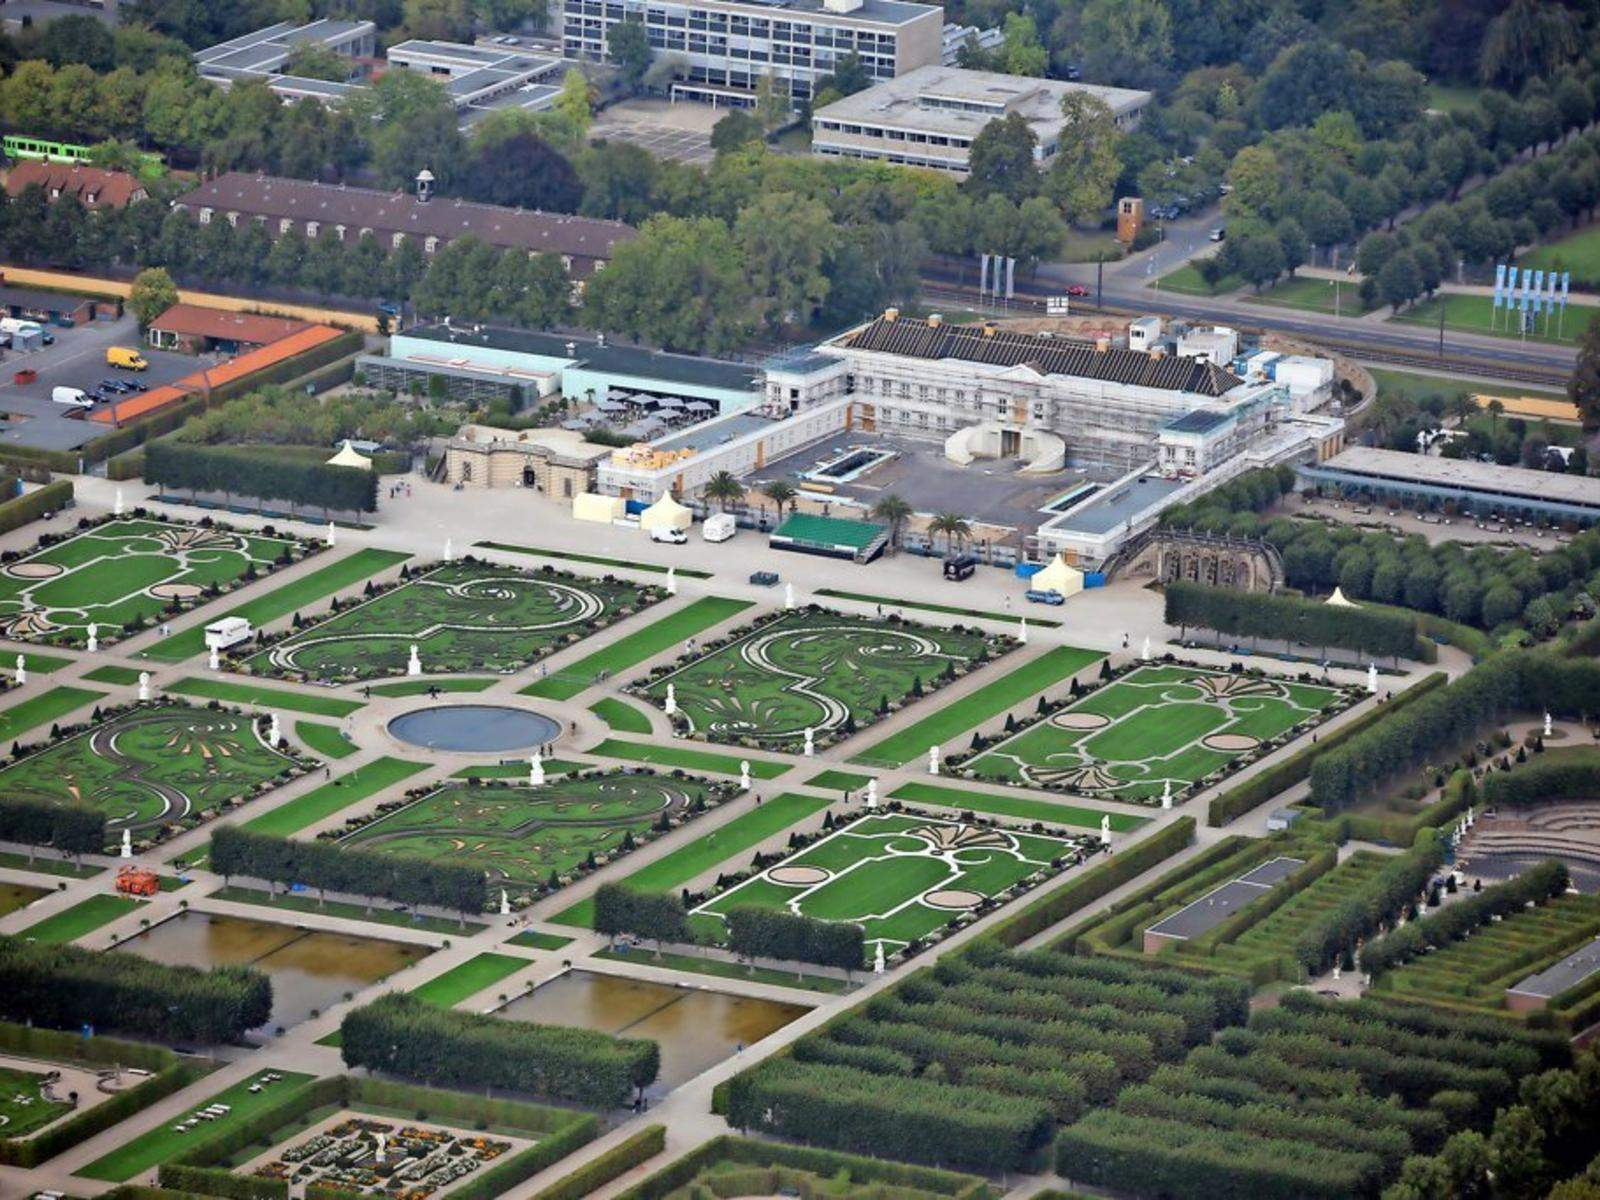 Hannover Herrenhausen Stadt Hannover investiert 20 Millionen Euro in den Erhalt der Herrenhaeuser Gaerten